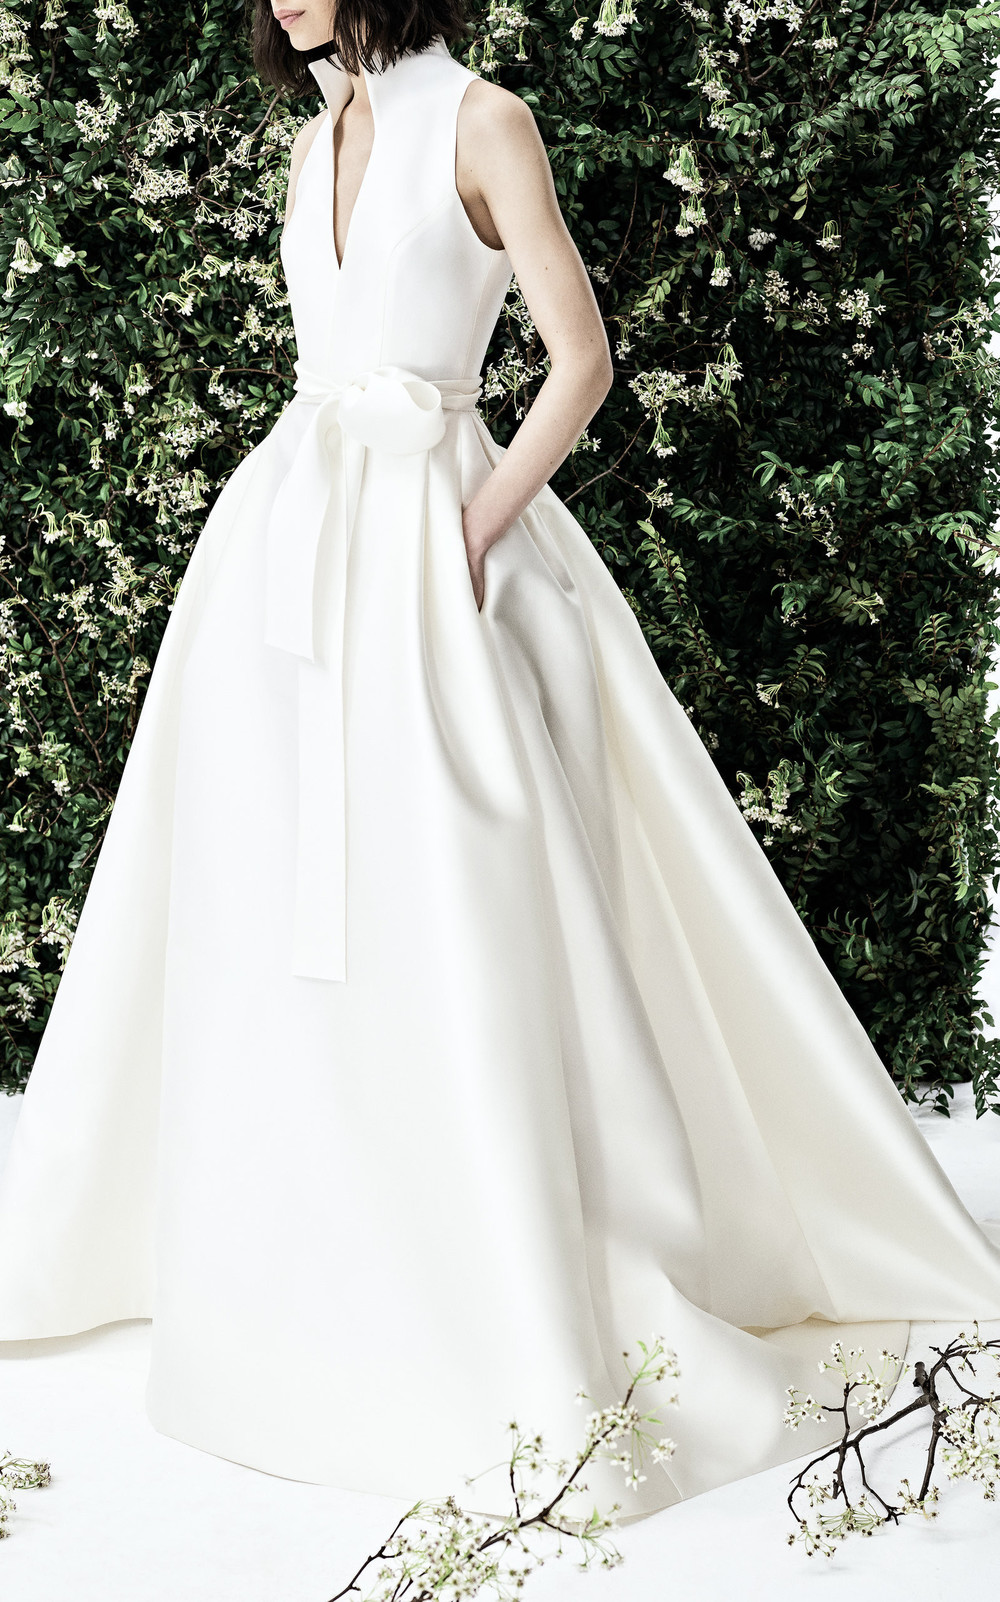 Carolina Herrera Lydia Gown in white